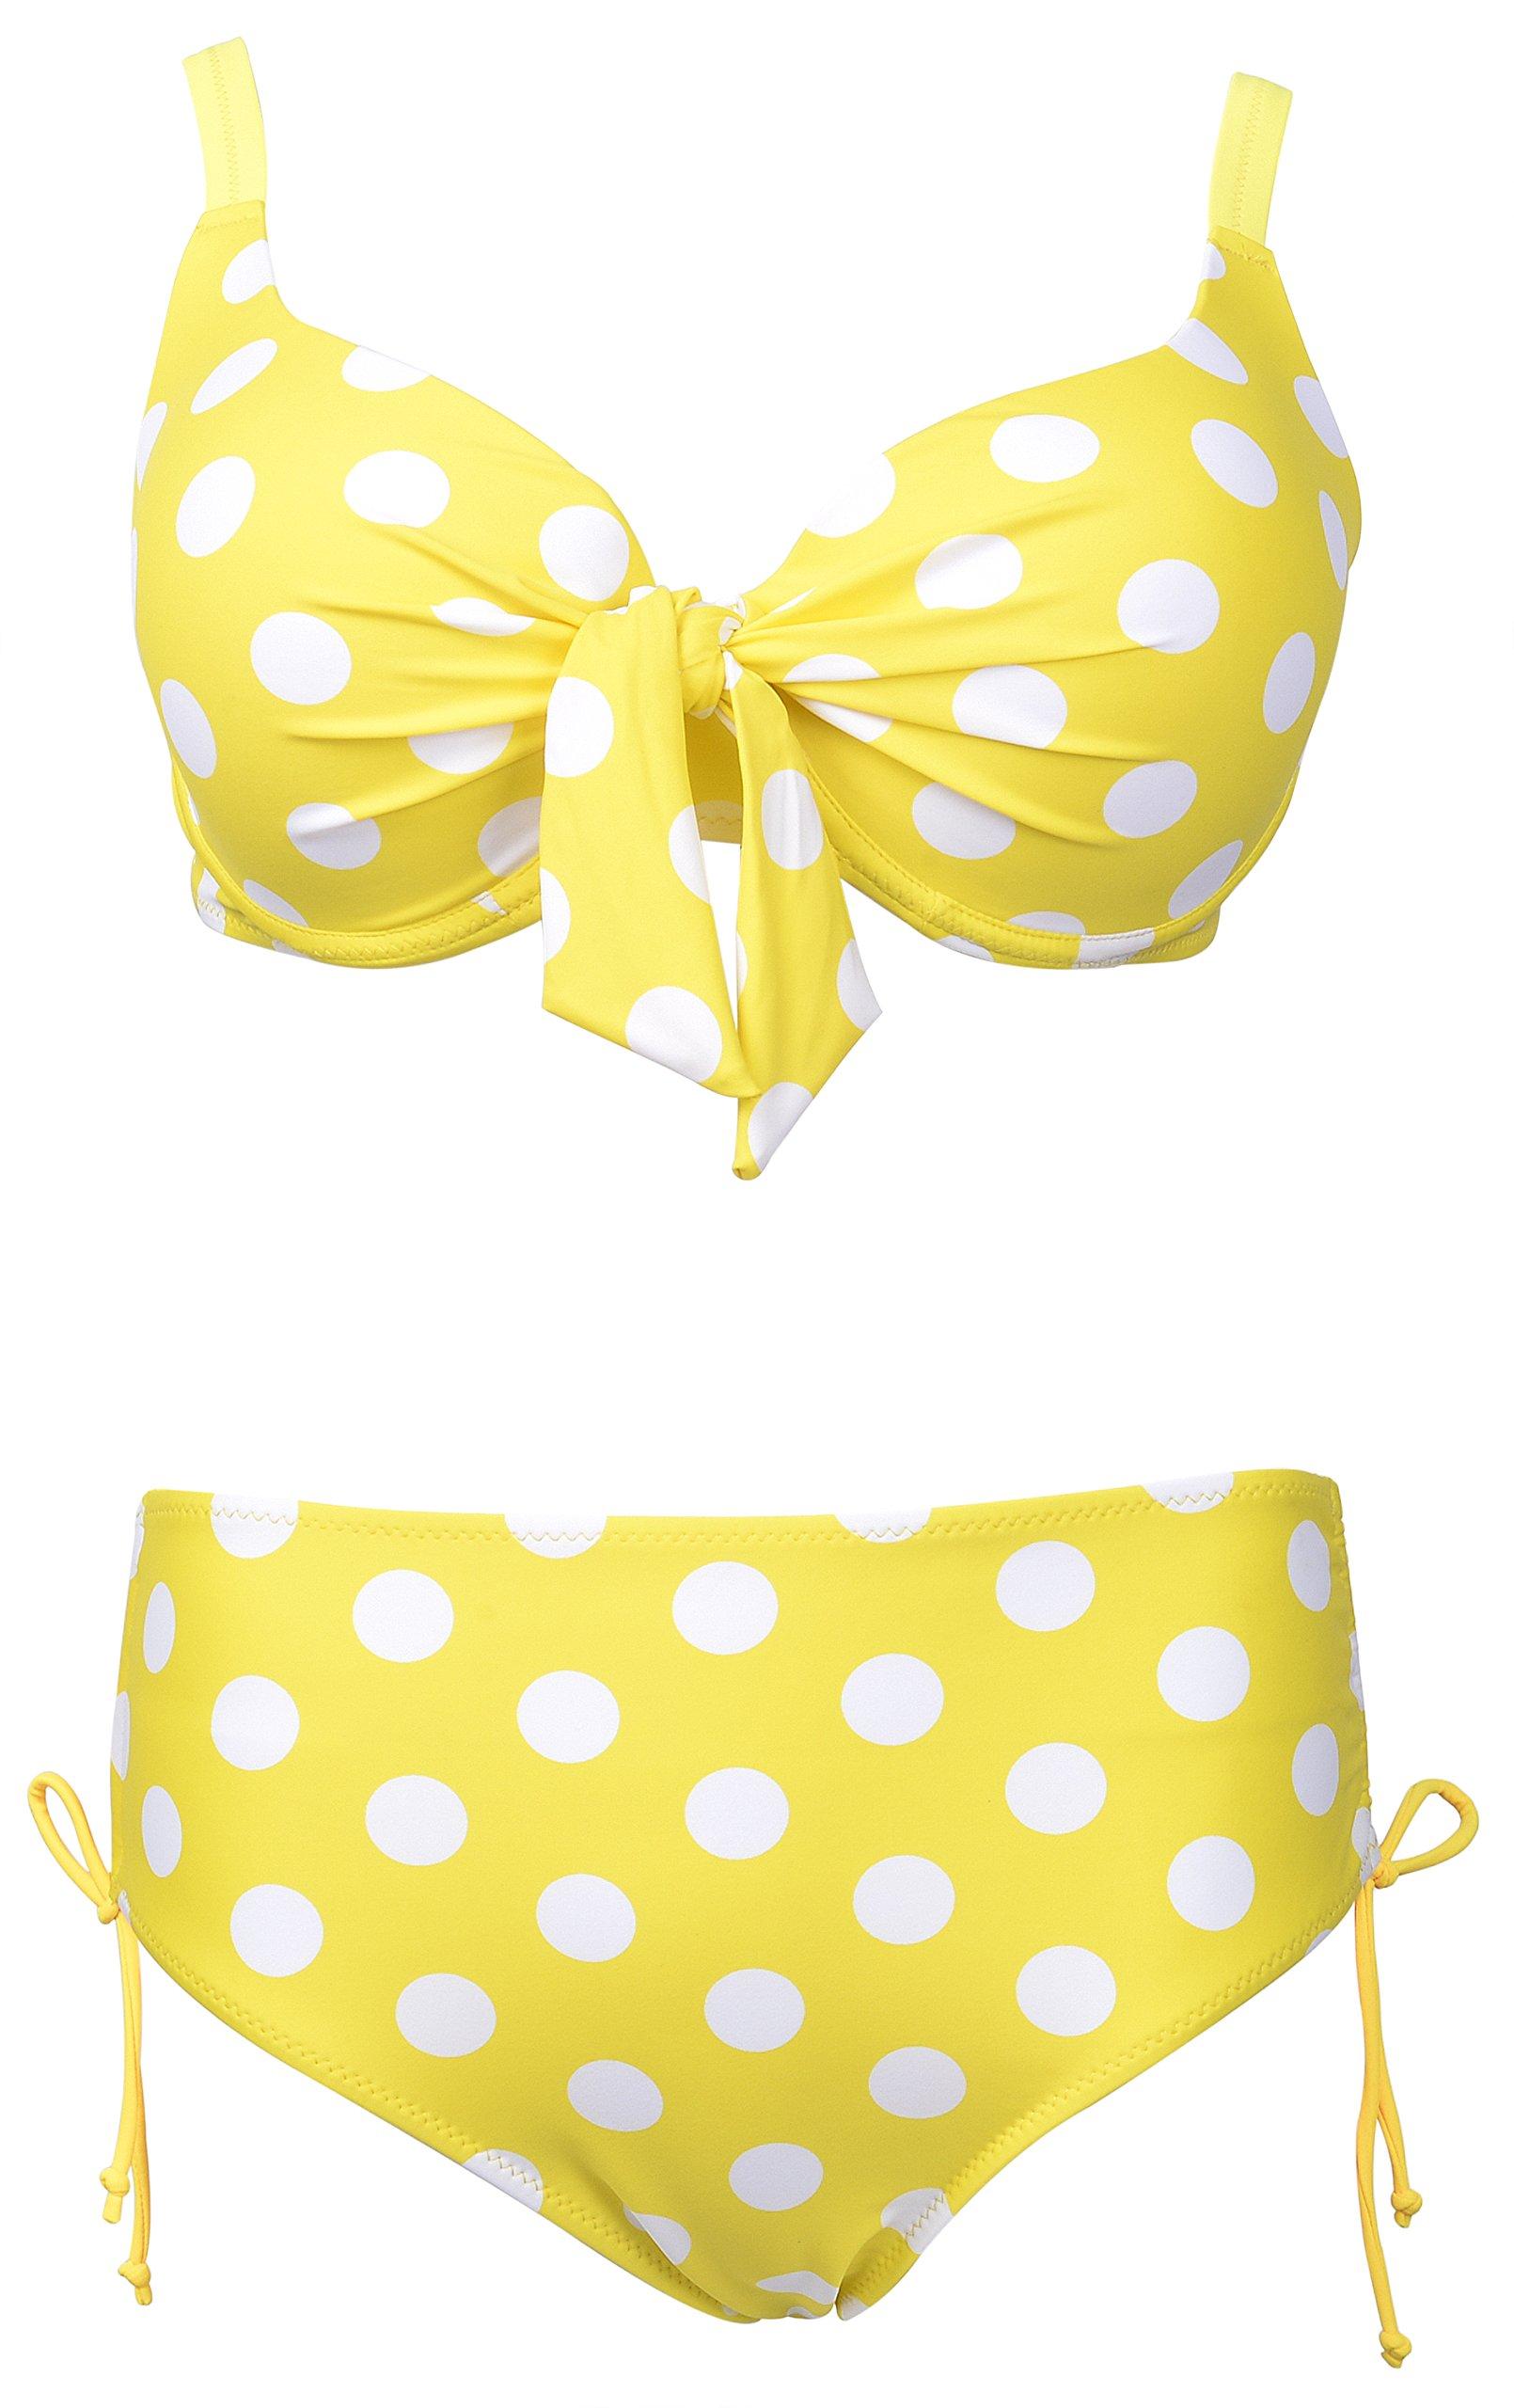 QZUnique Women's Plus Dot Vintage Bikini Bow Busted Push up 2 Pieces Swimsuit Swimwear Yellow White US 18-20W